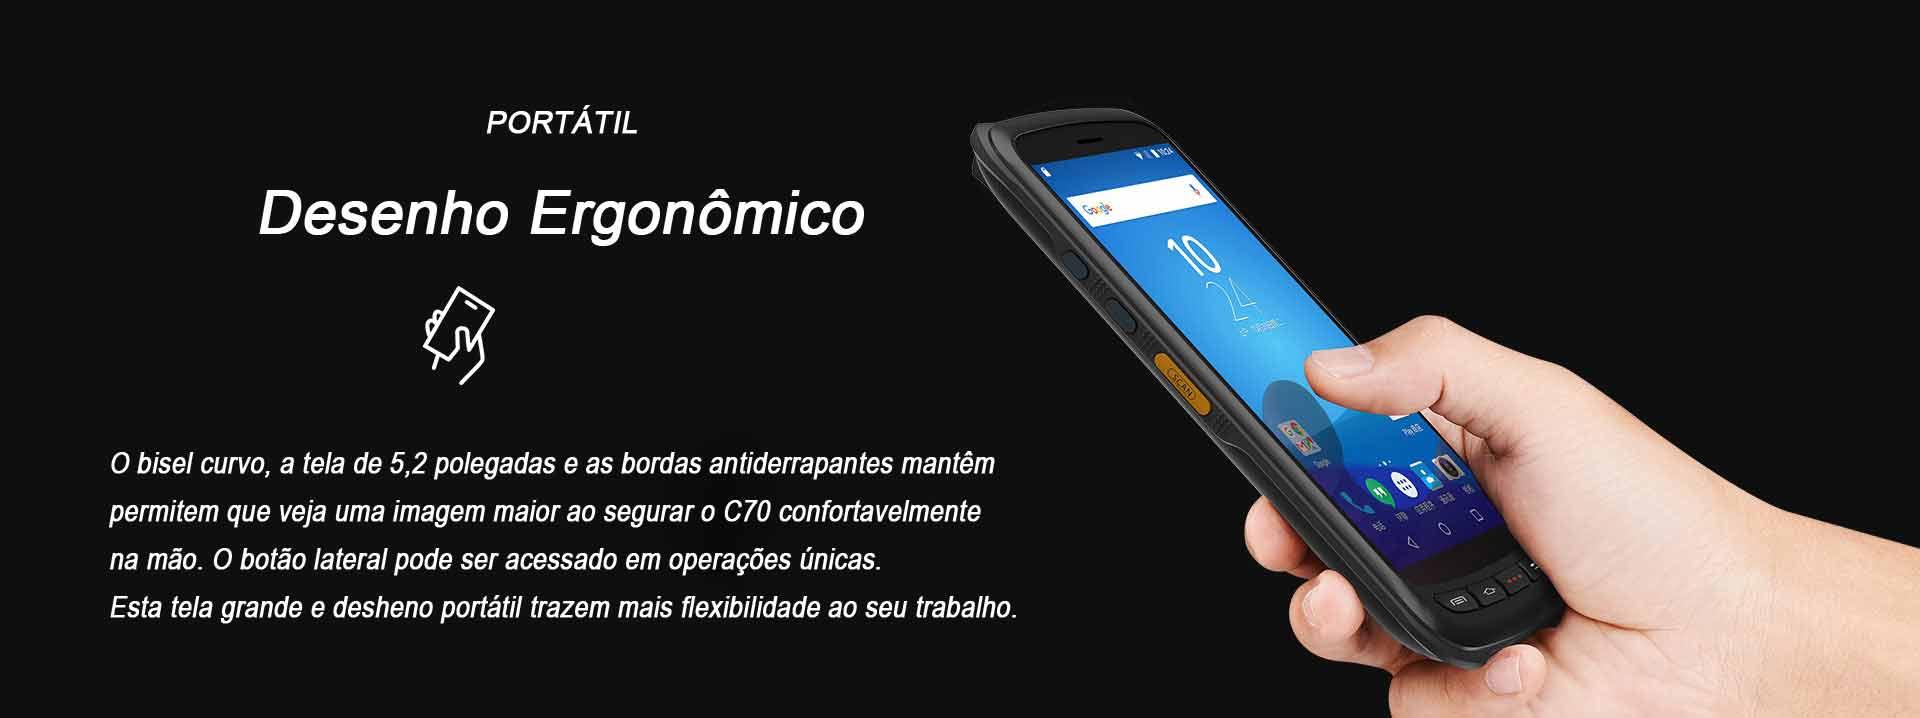 Terminal Móvel C70 Chainway Android Ergonomico